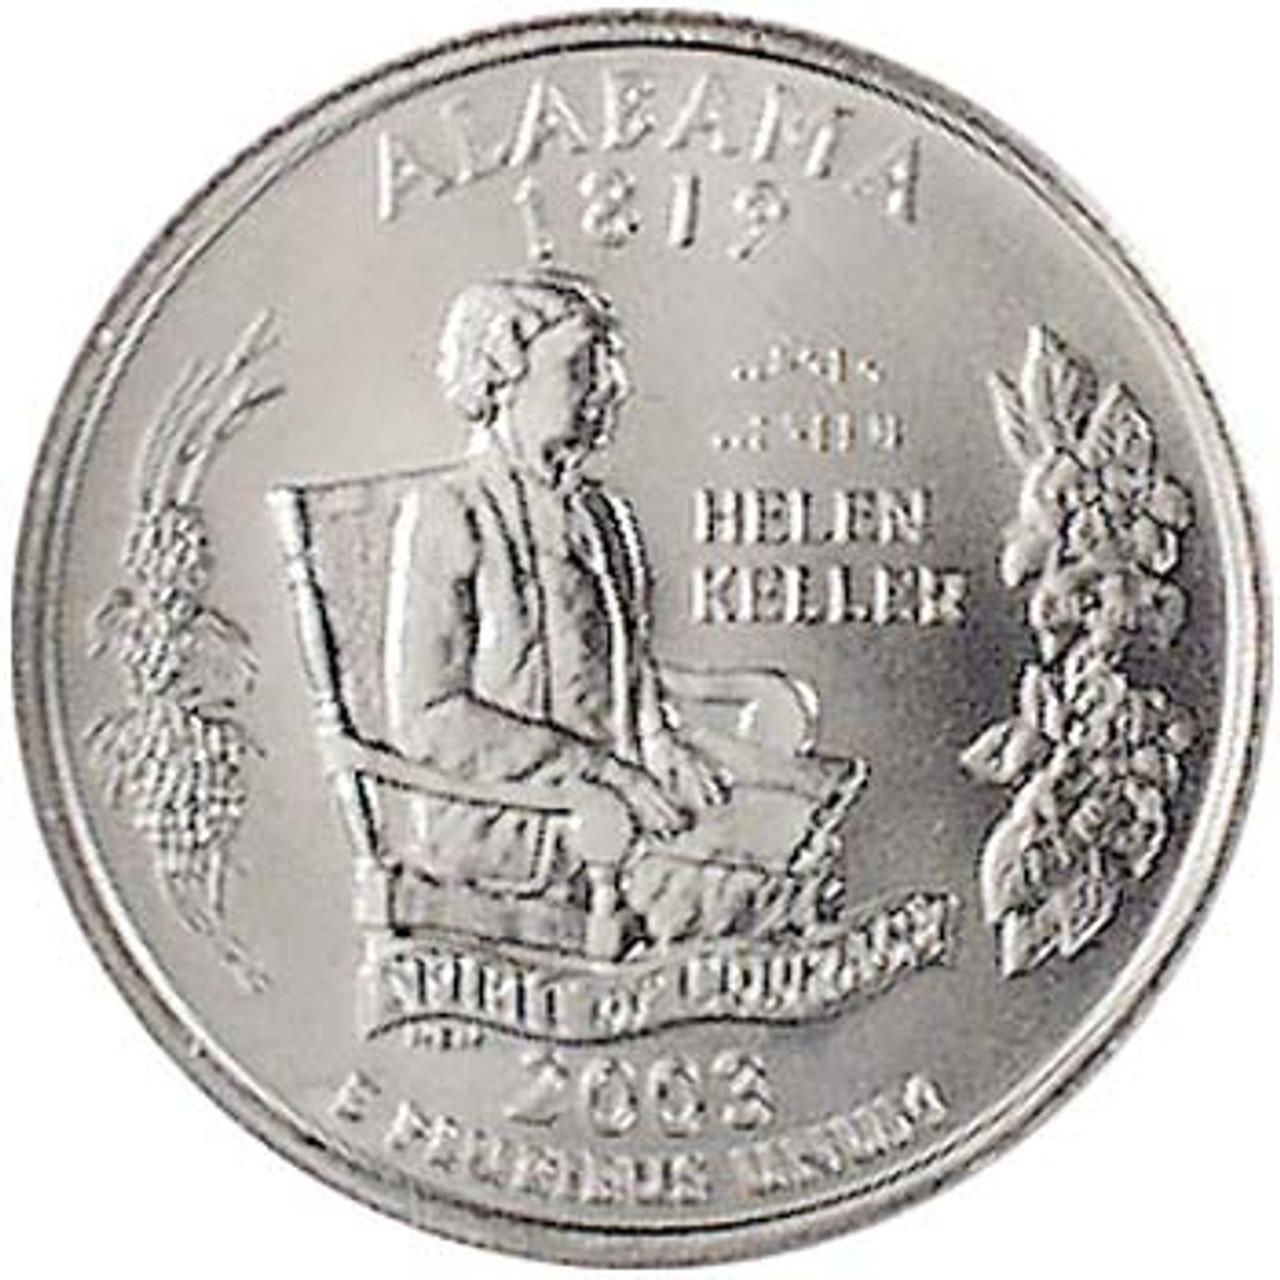 2003-D Alabama Quarter Brilliant Uncirculated Image 1